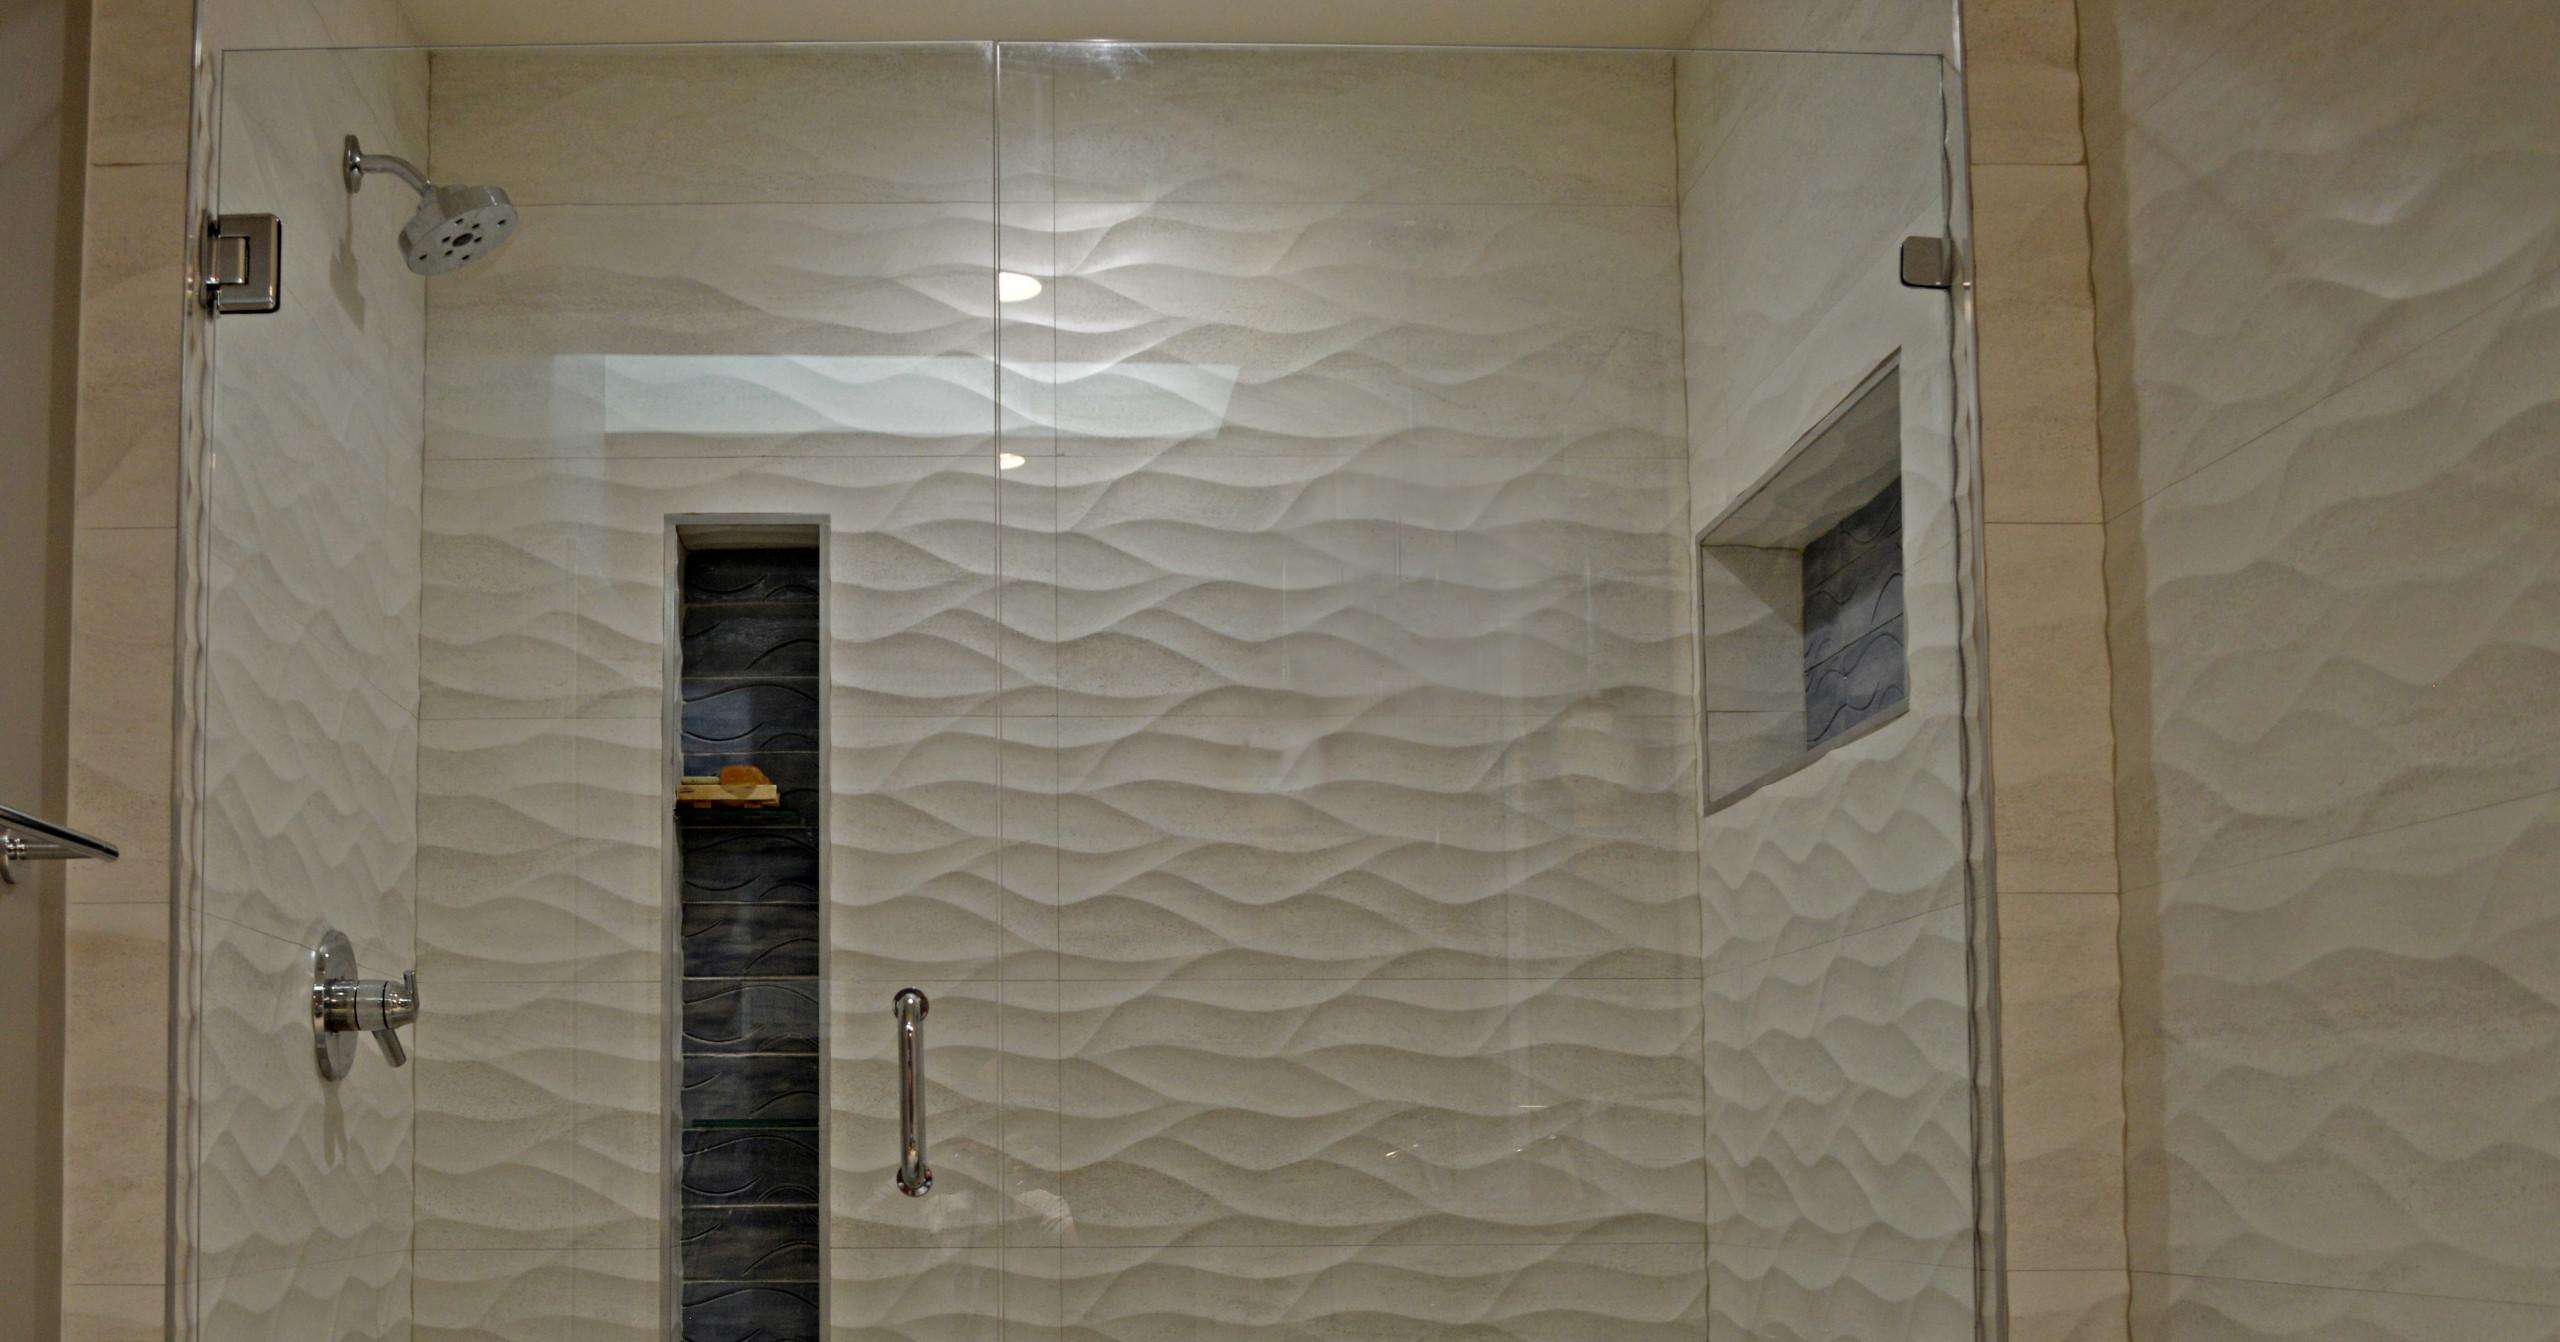 Hilltop Kitchen and Master Bath